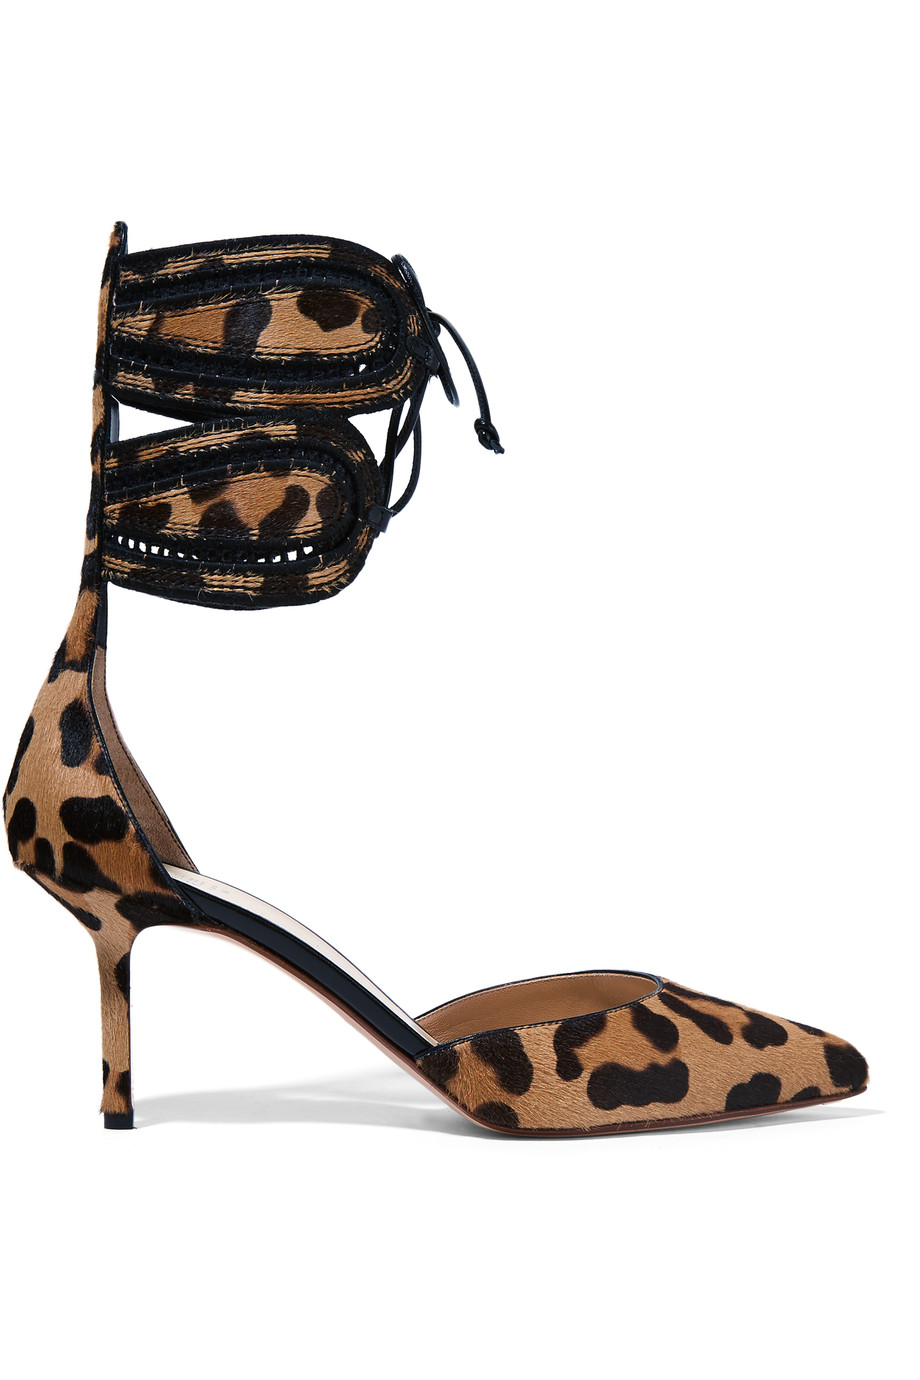 Francesco Russo Leathers Leather-trimmed leopard-print calf hair pumps